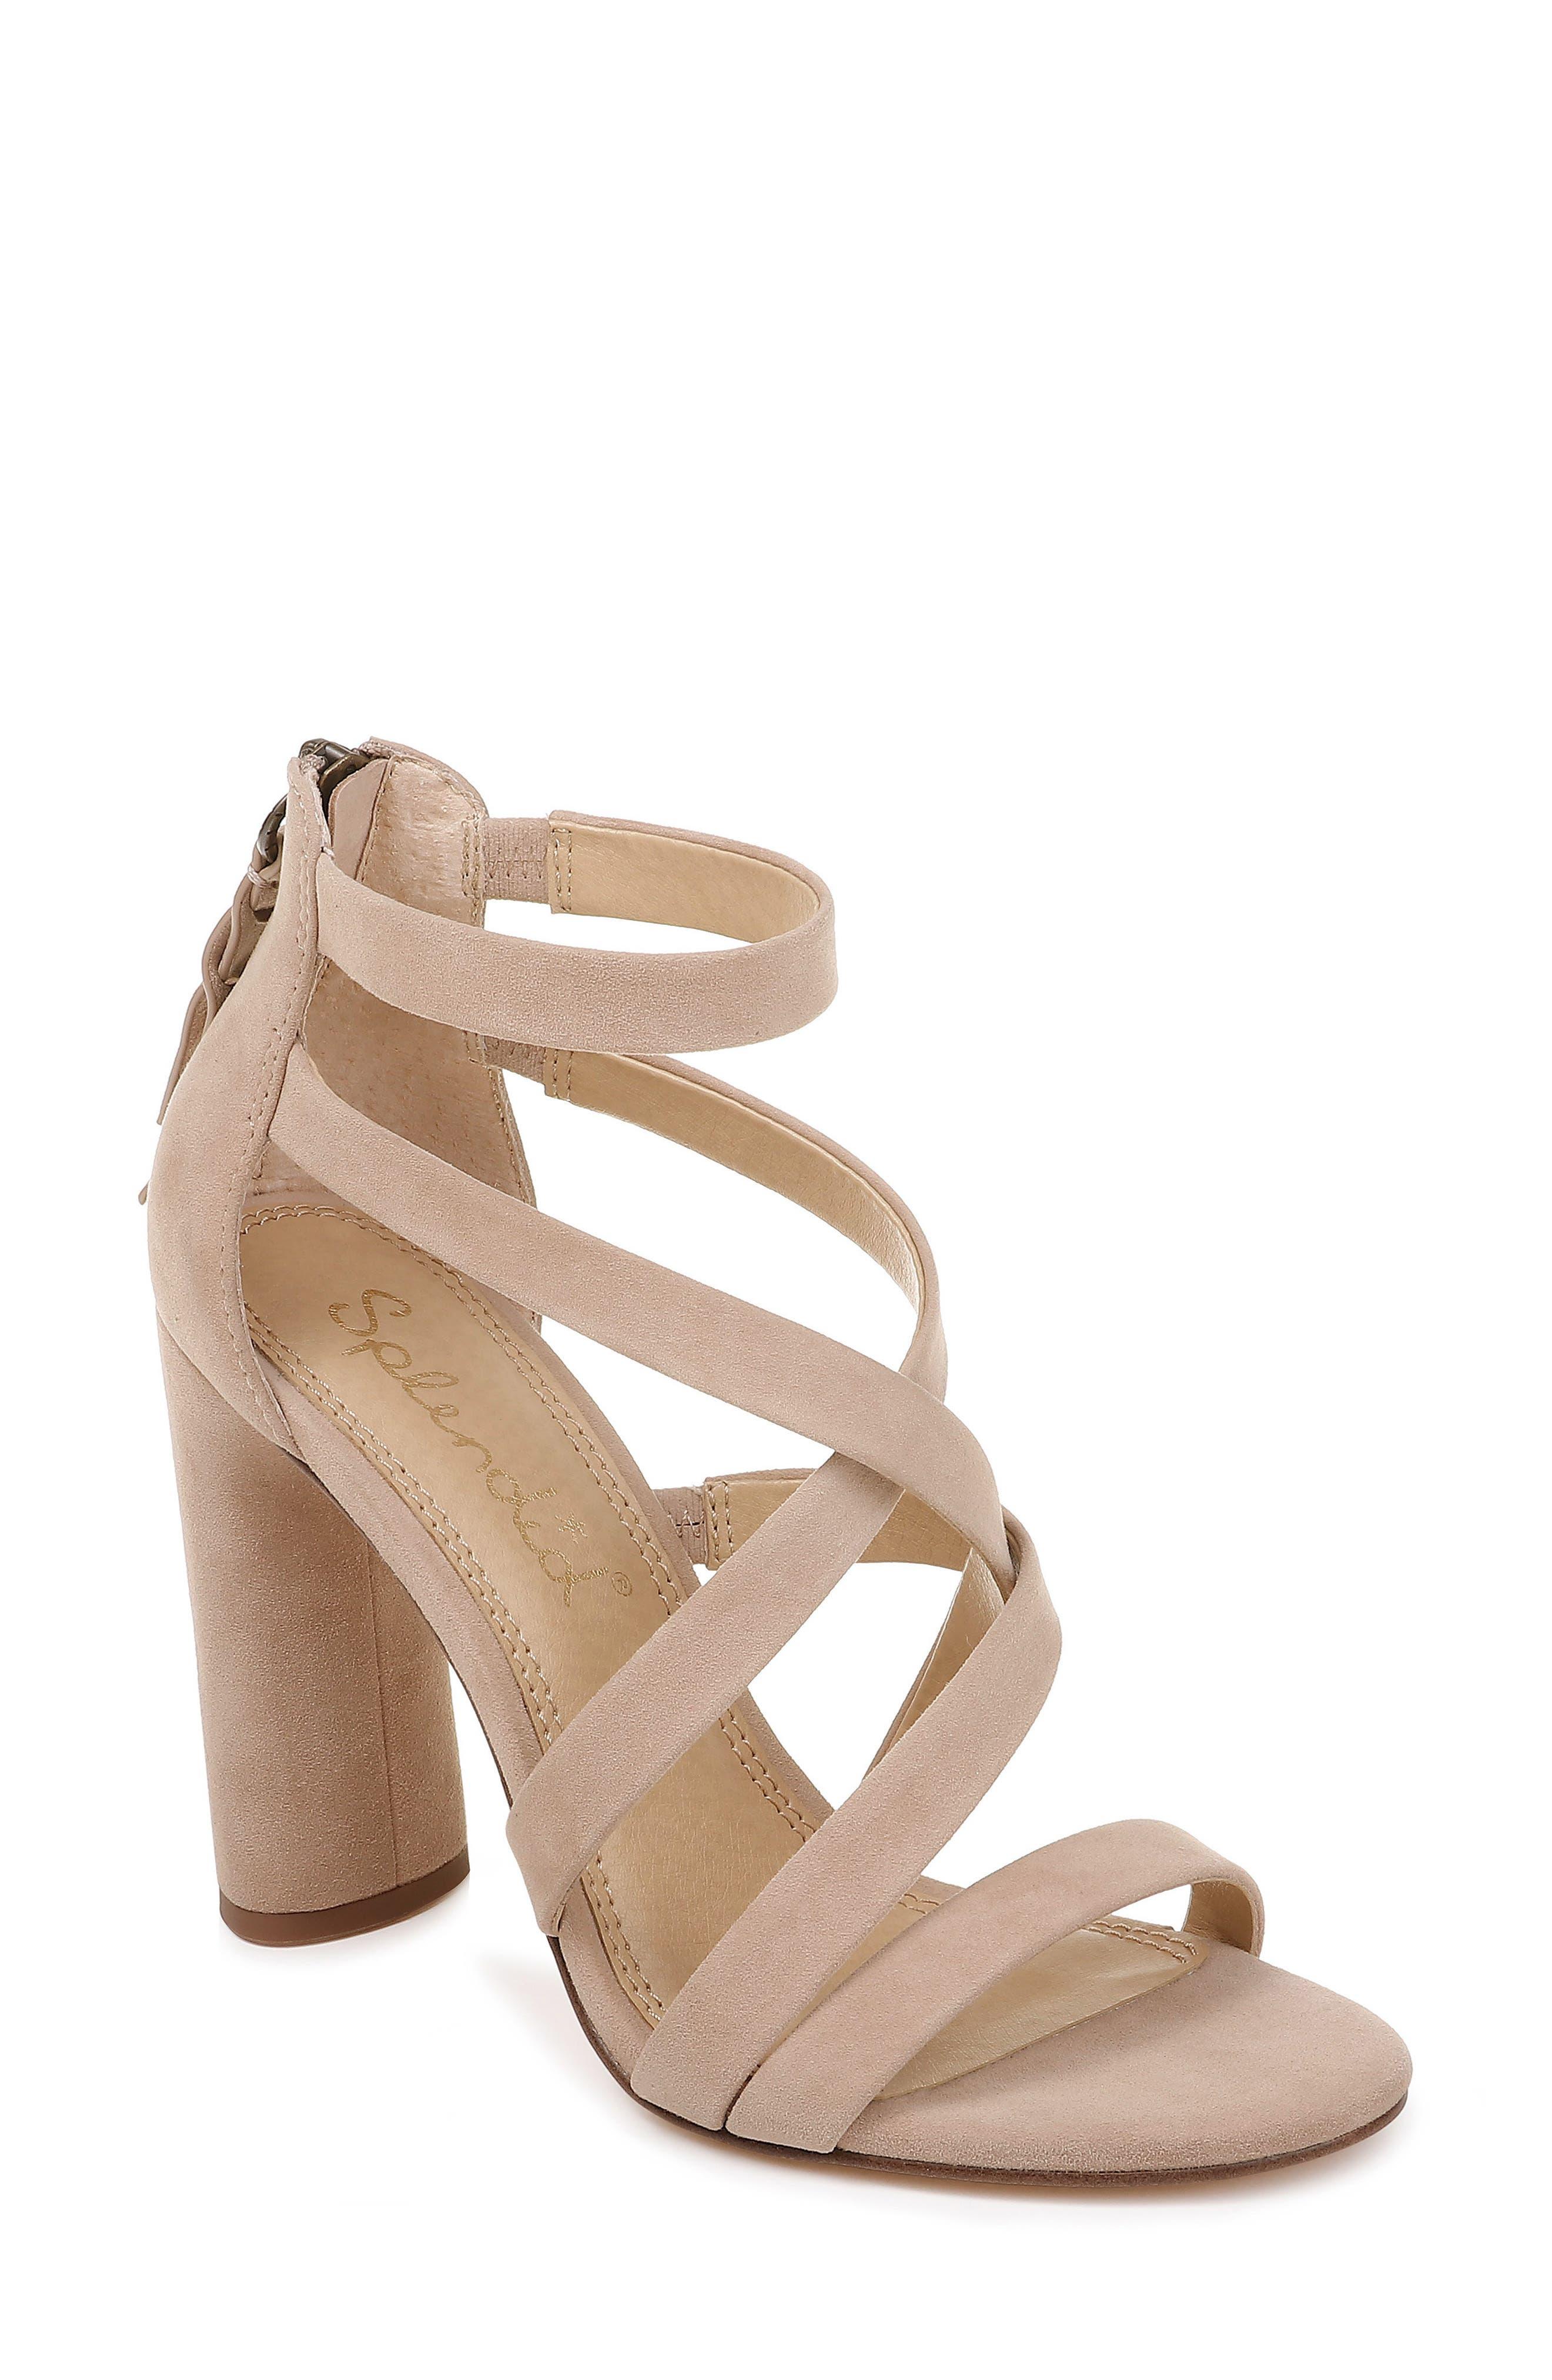 Women S Splendid Sandals